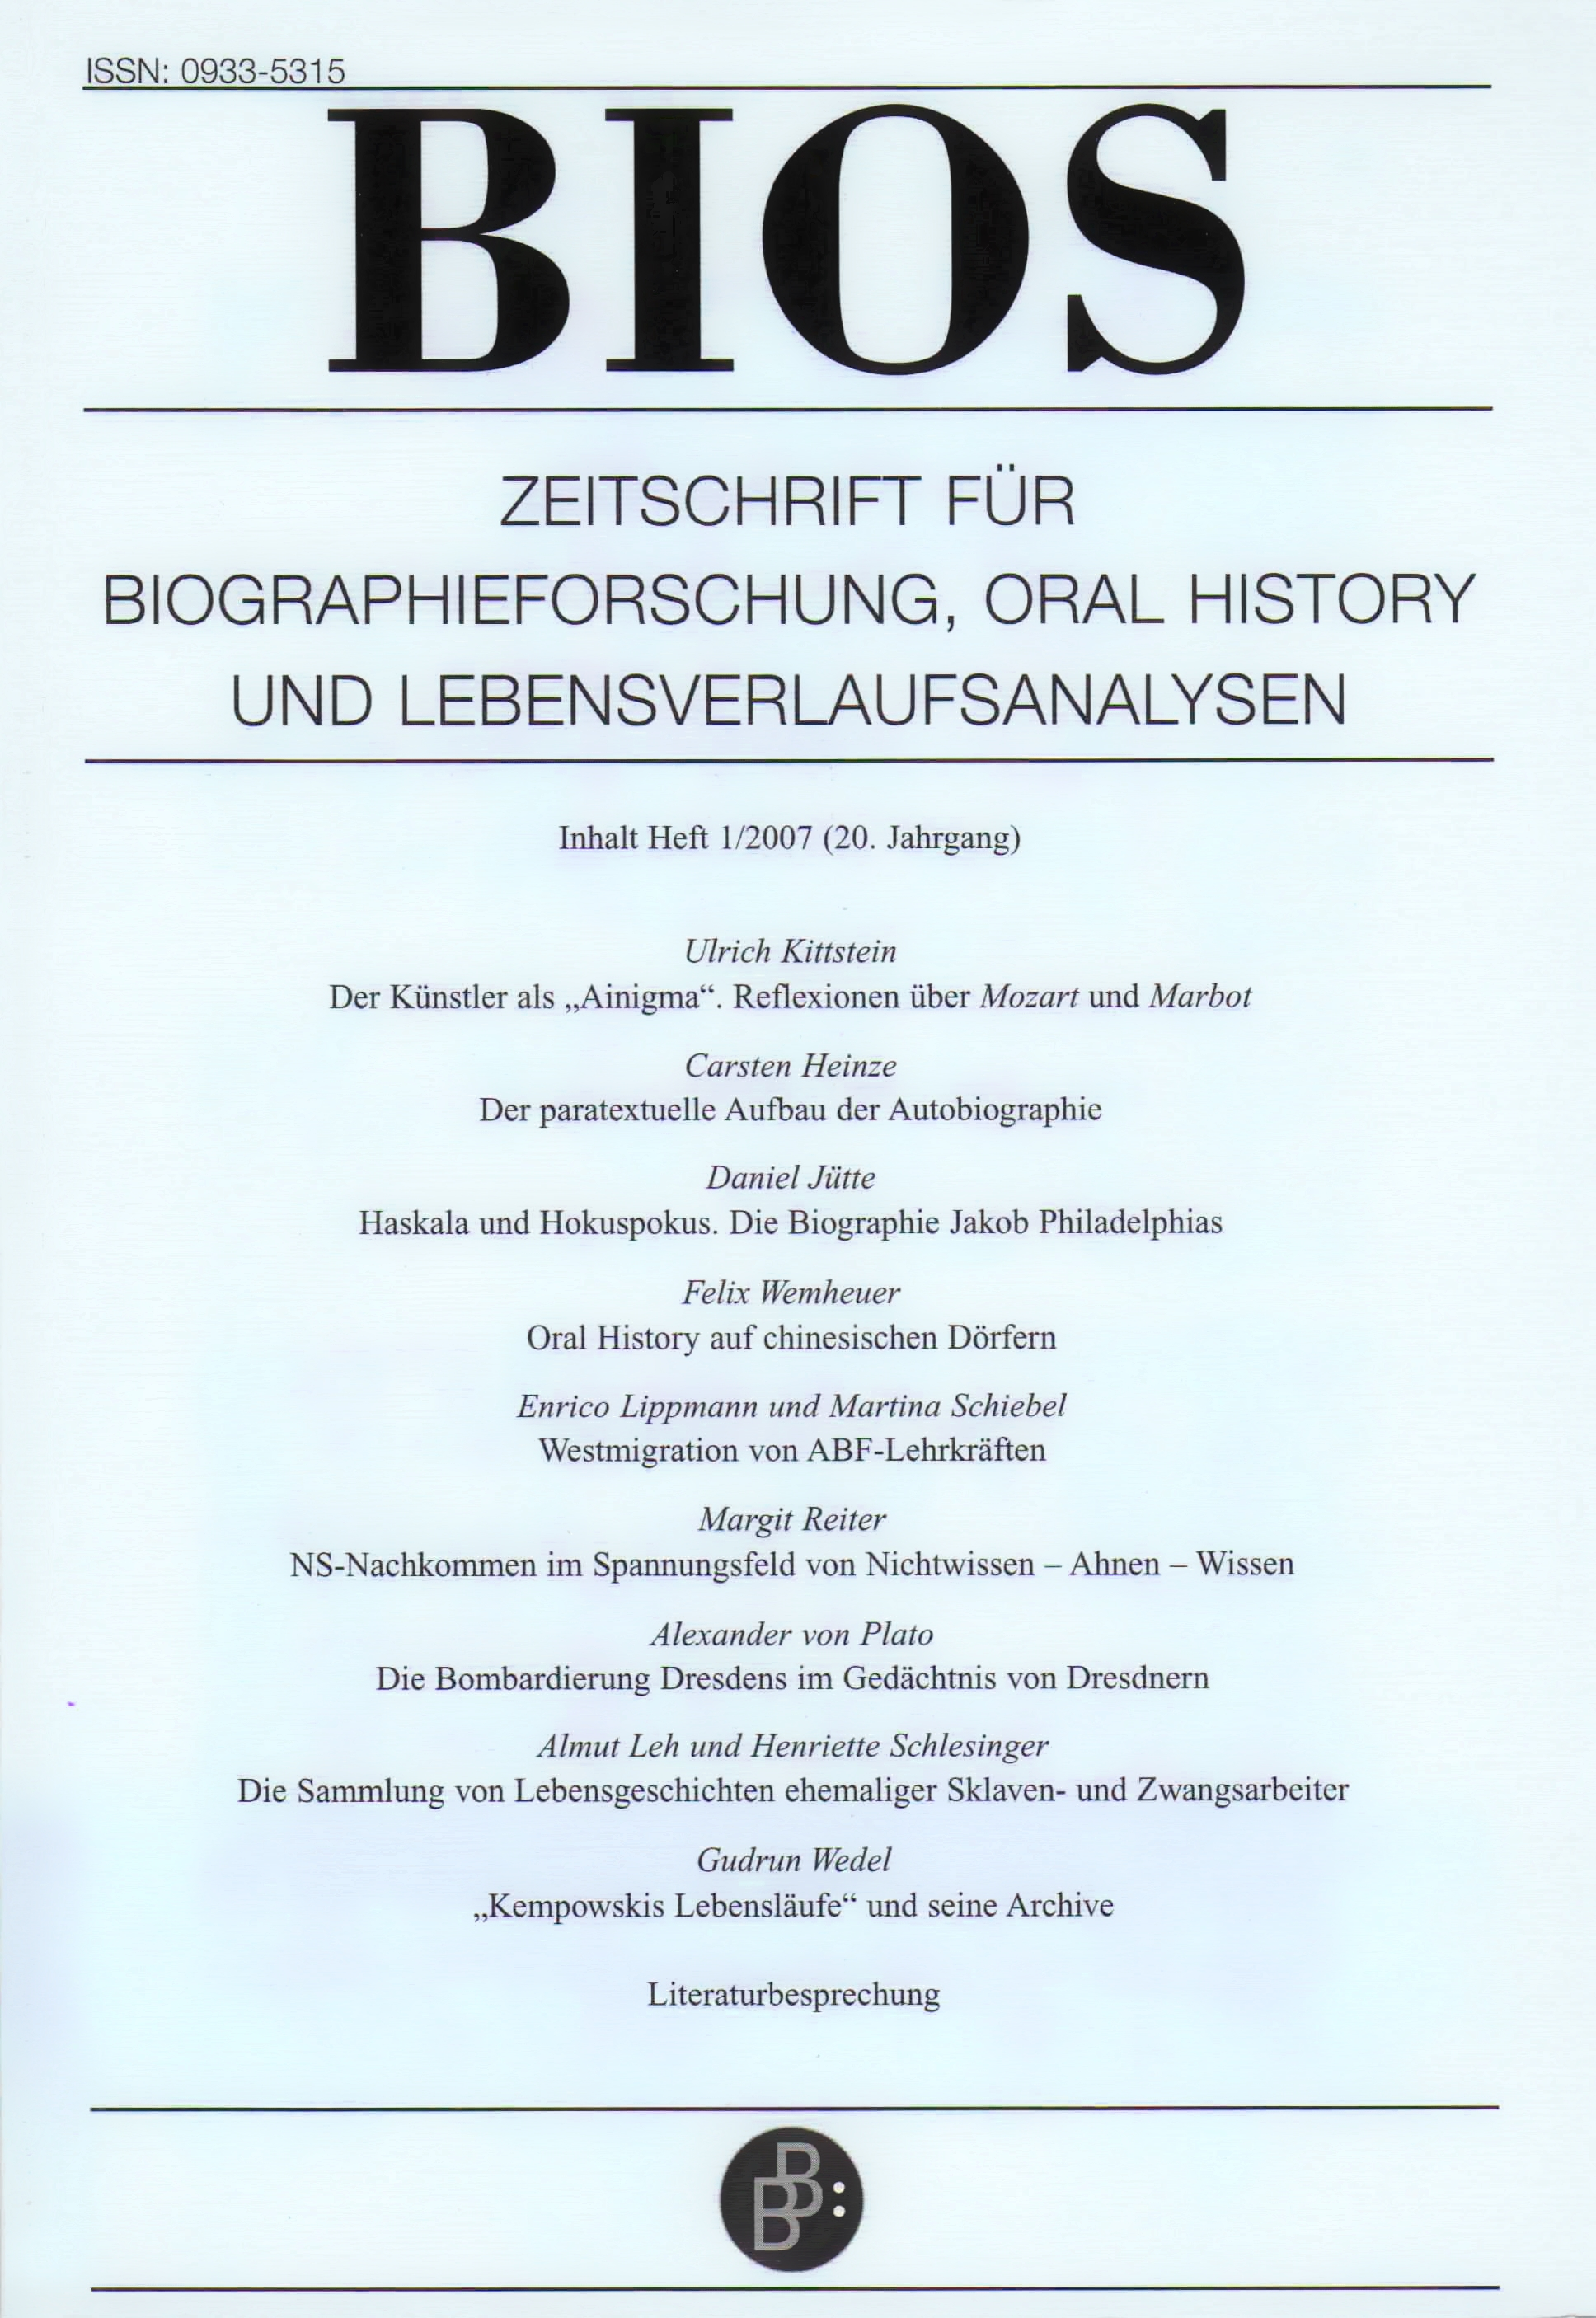 BIOS 1-2007 | Freie Beiträge